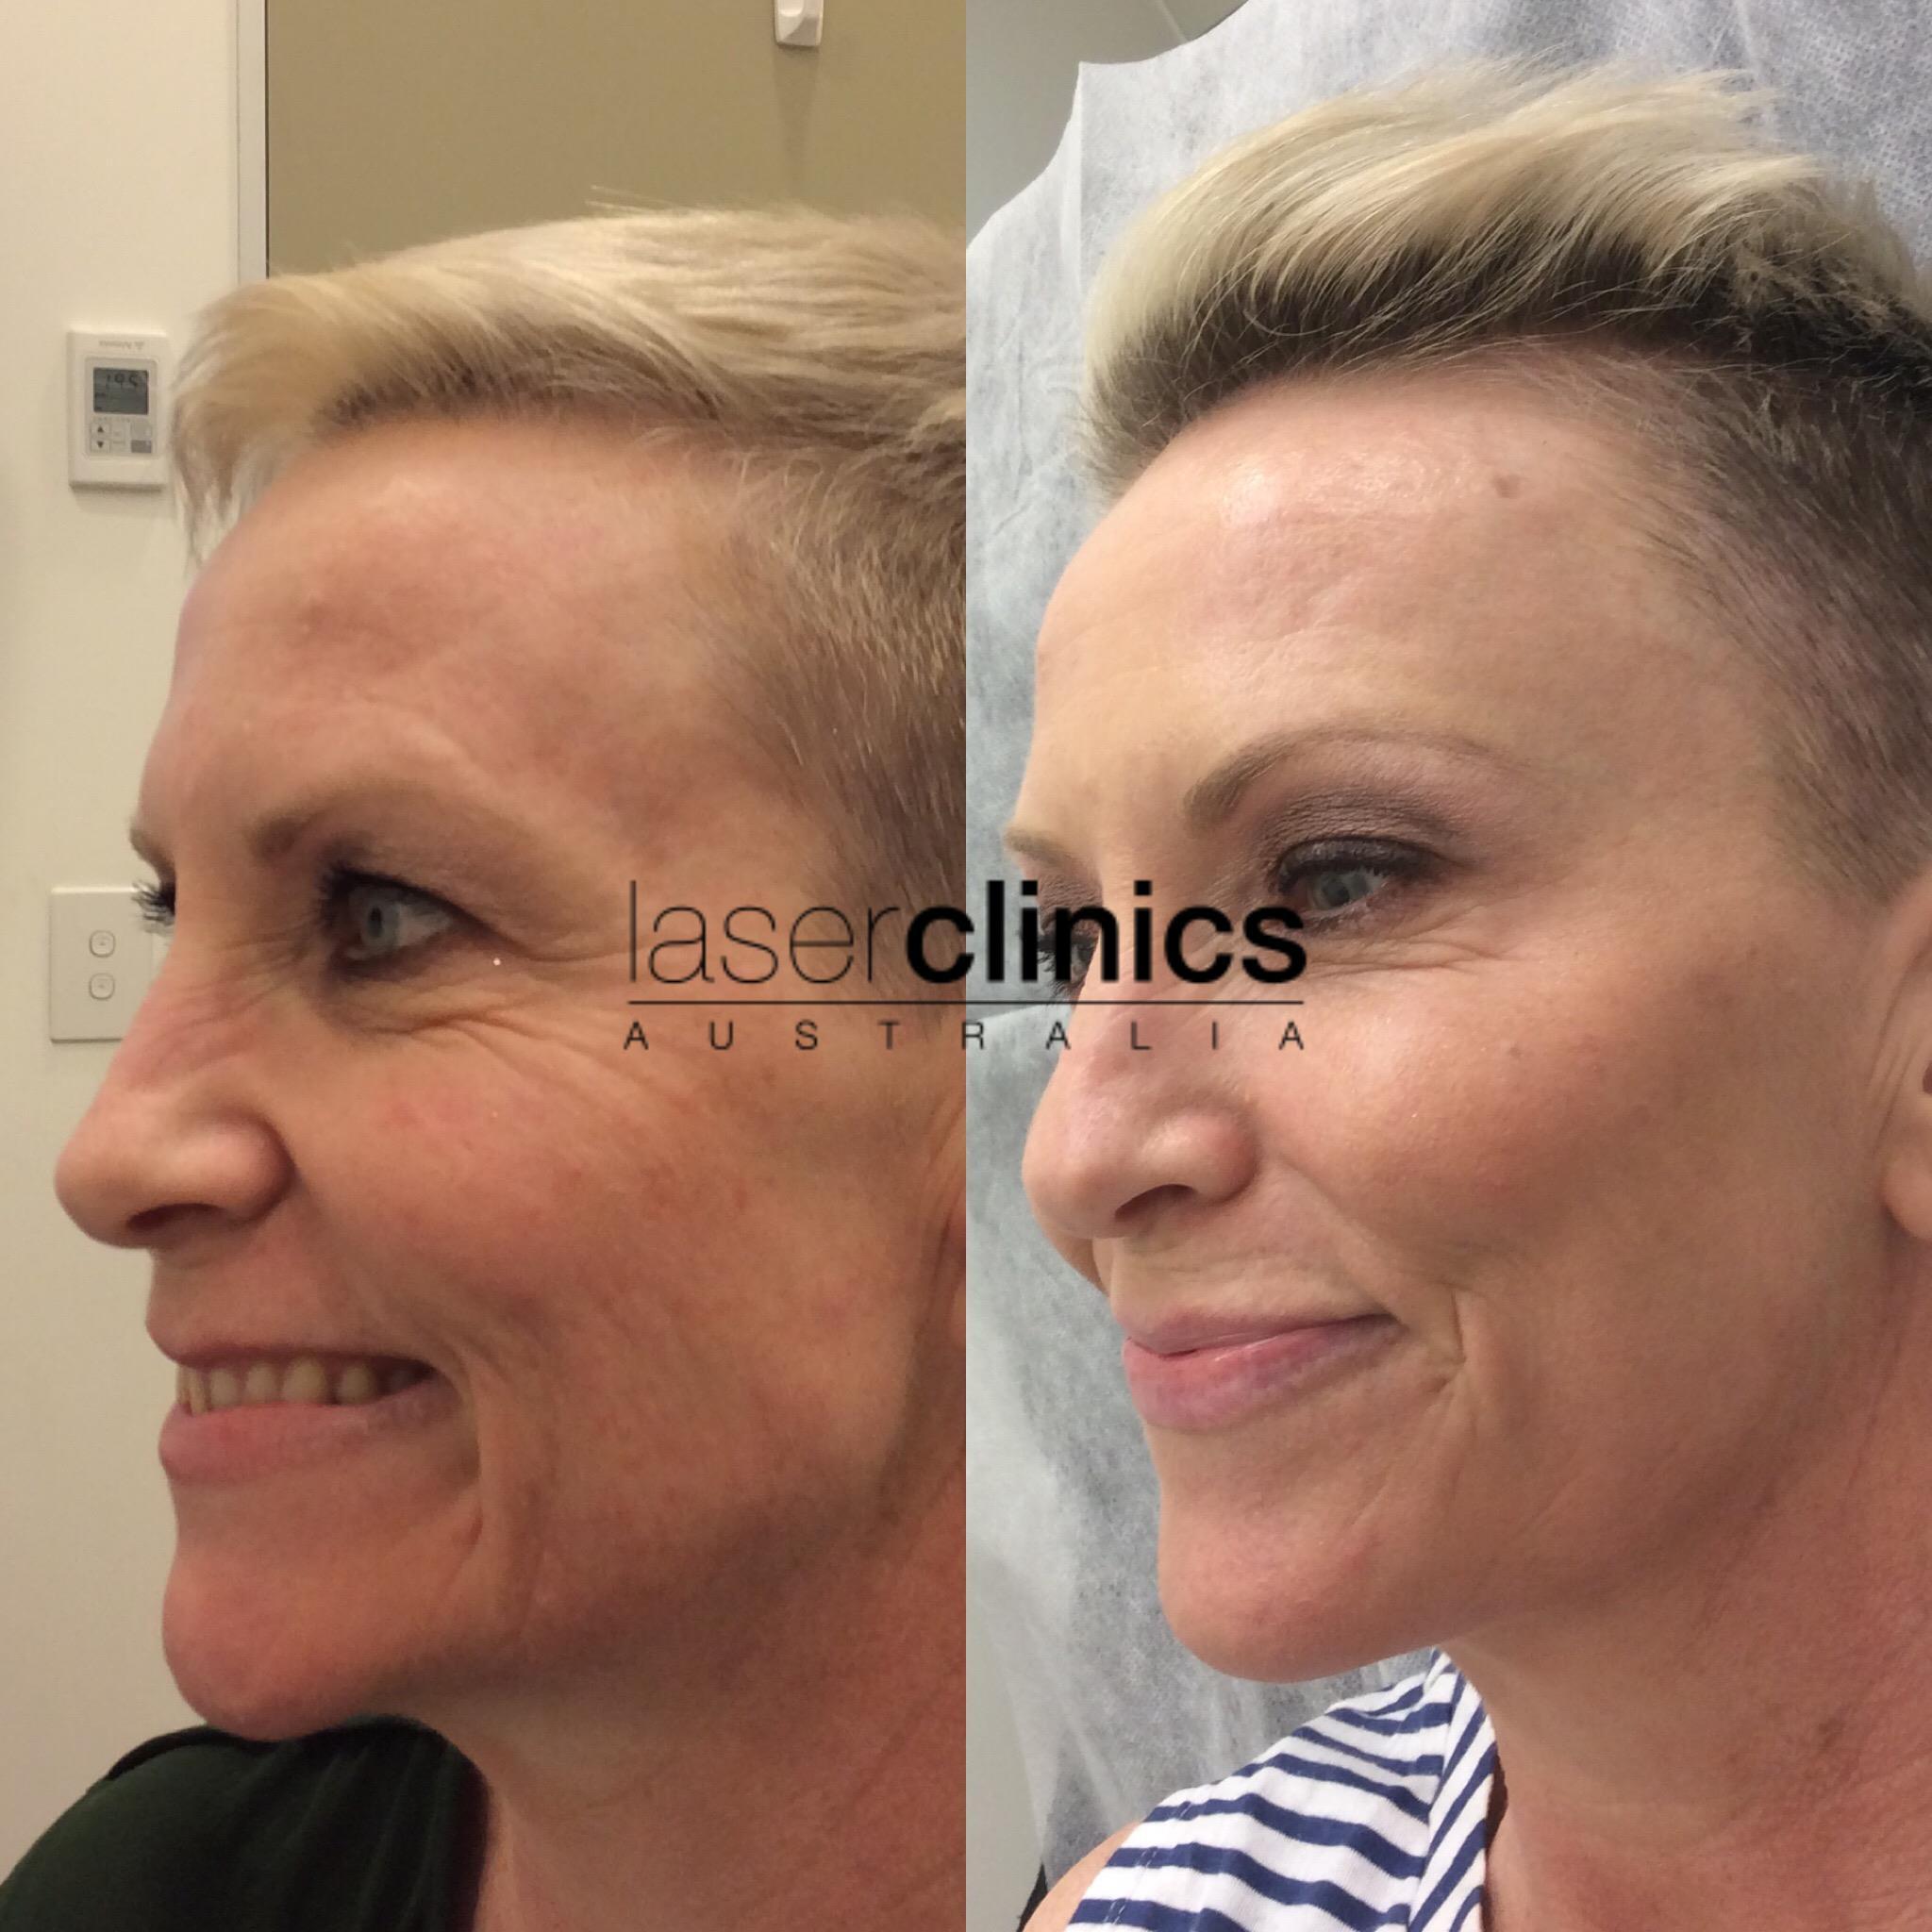 Queens Plaza | Laser Clinics Australia